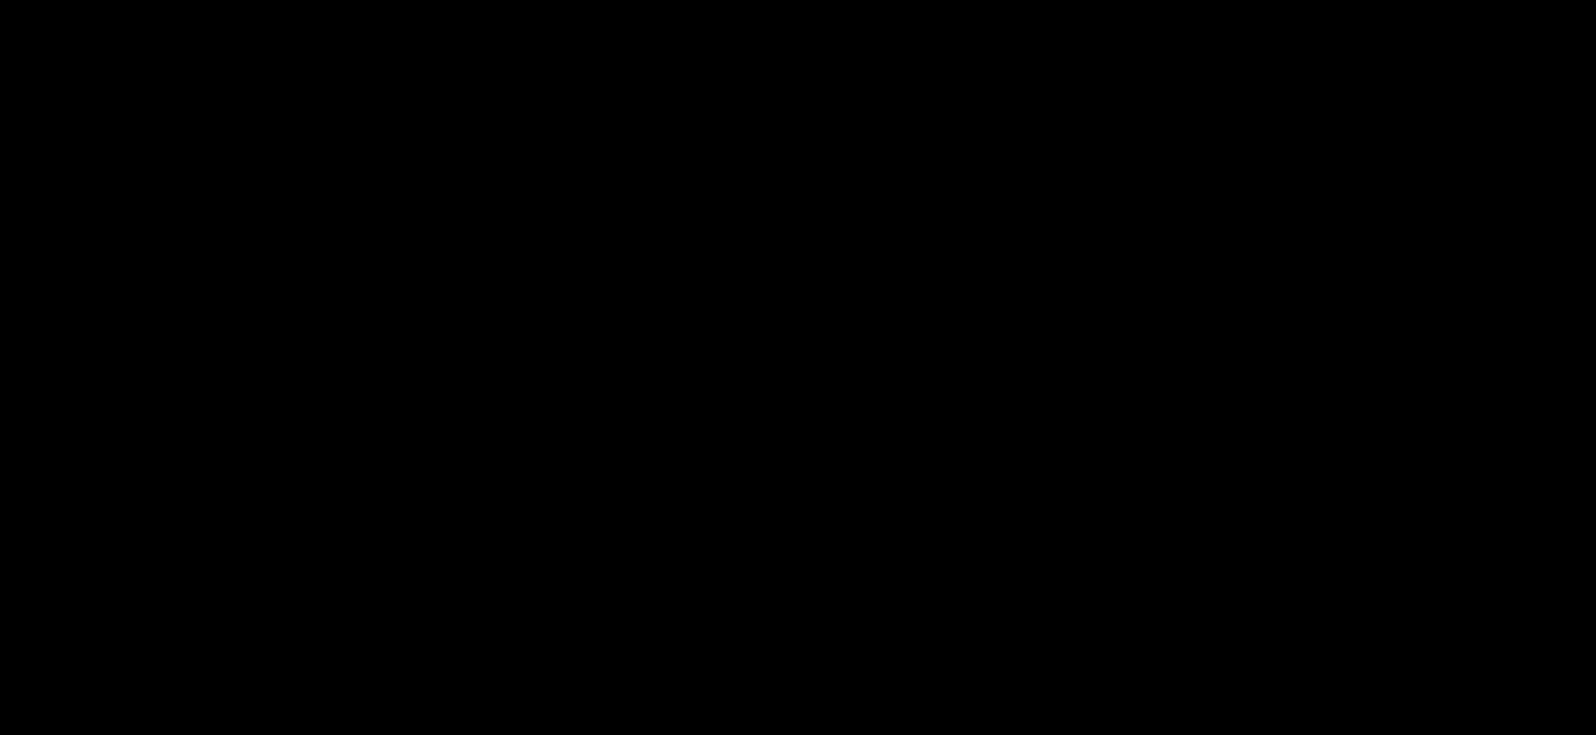 trans-(15S)-Latanoprost Acid